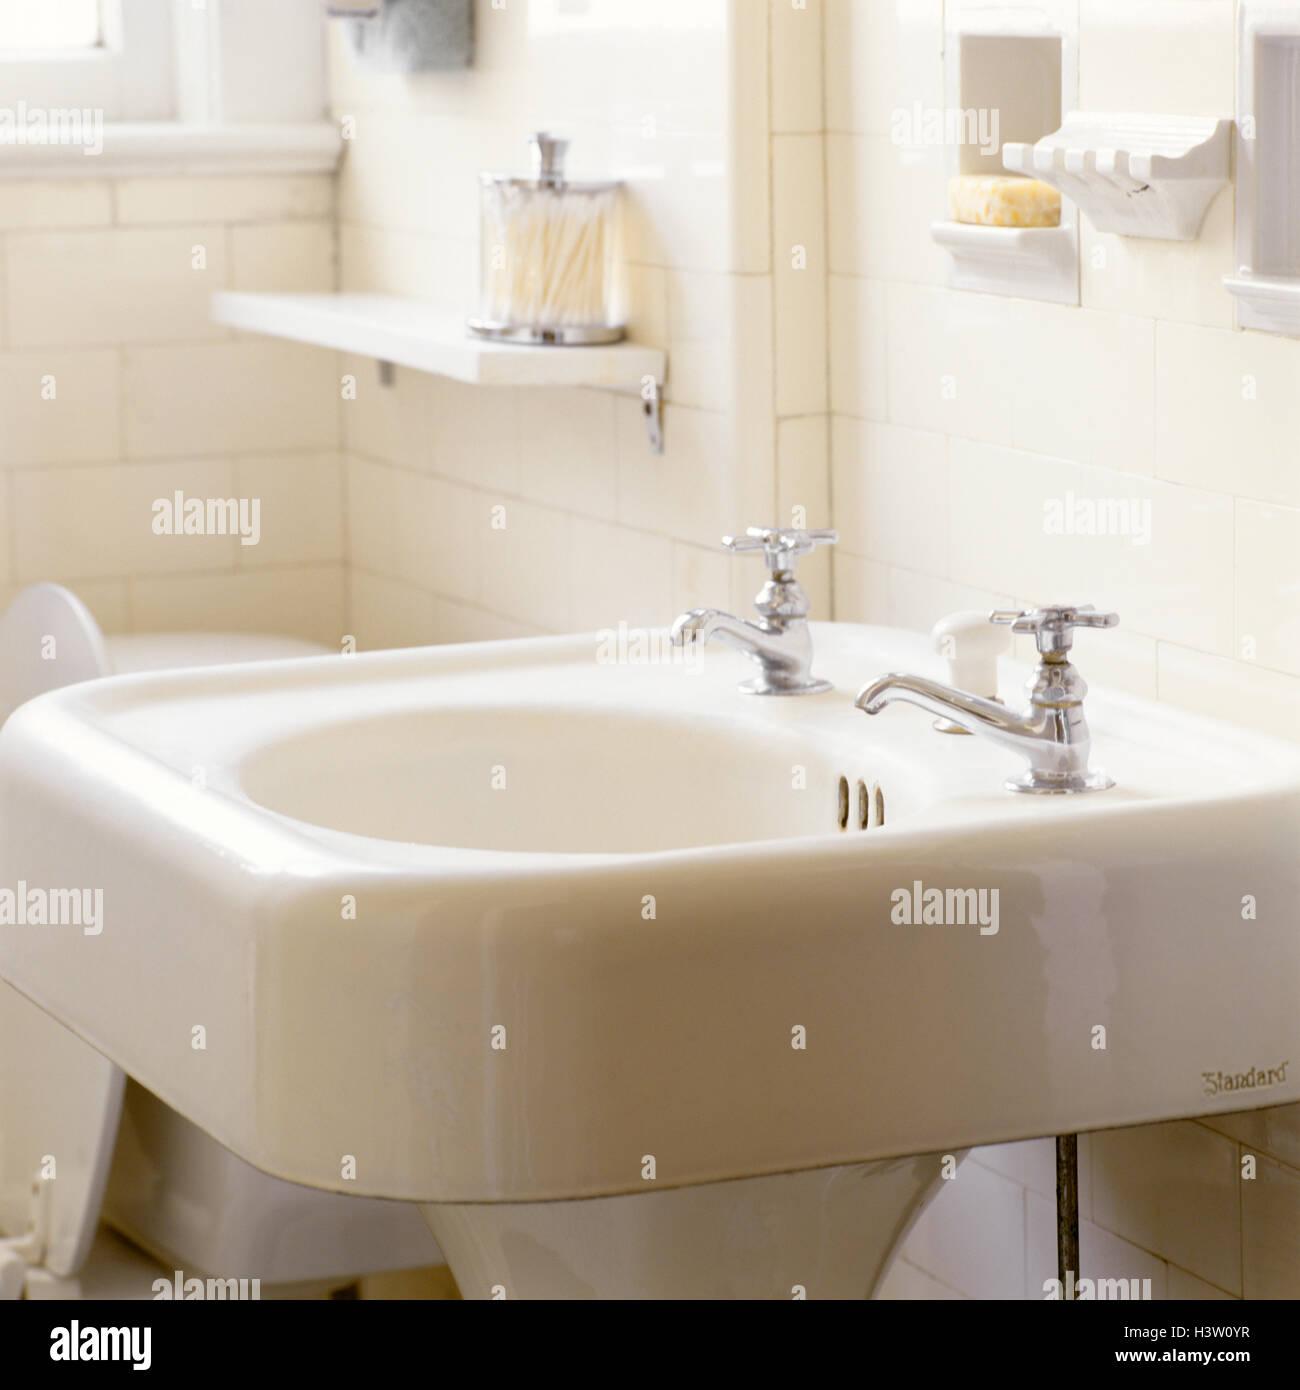 https www alamy com stock photo 1930s 1940s style antique porcelain pedestal sink in white tile bathroom 122866123 html